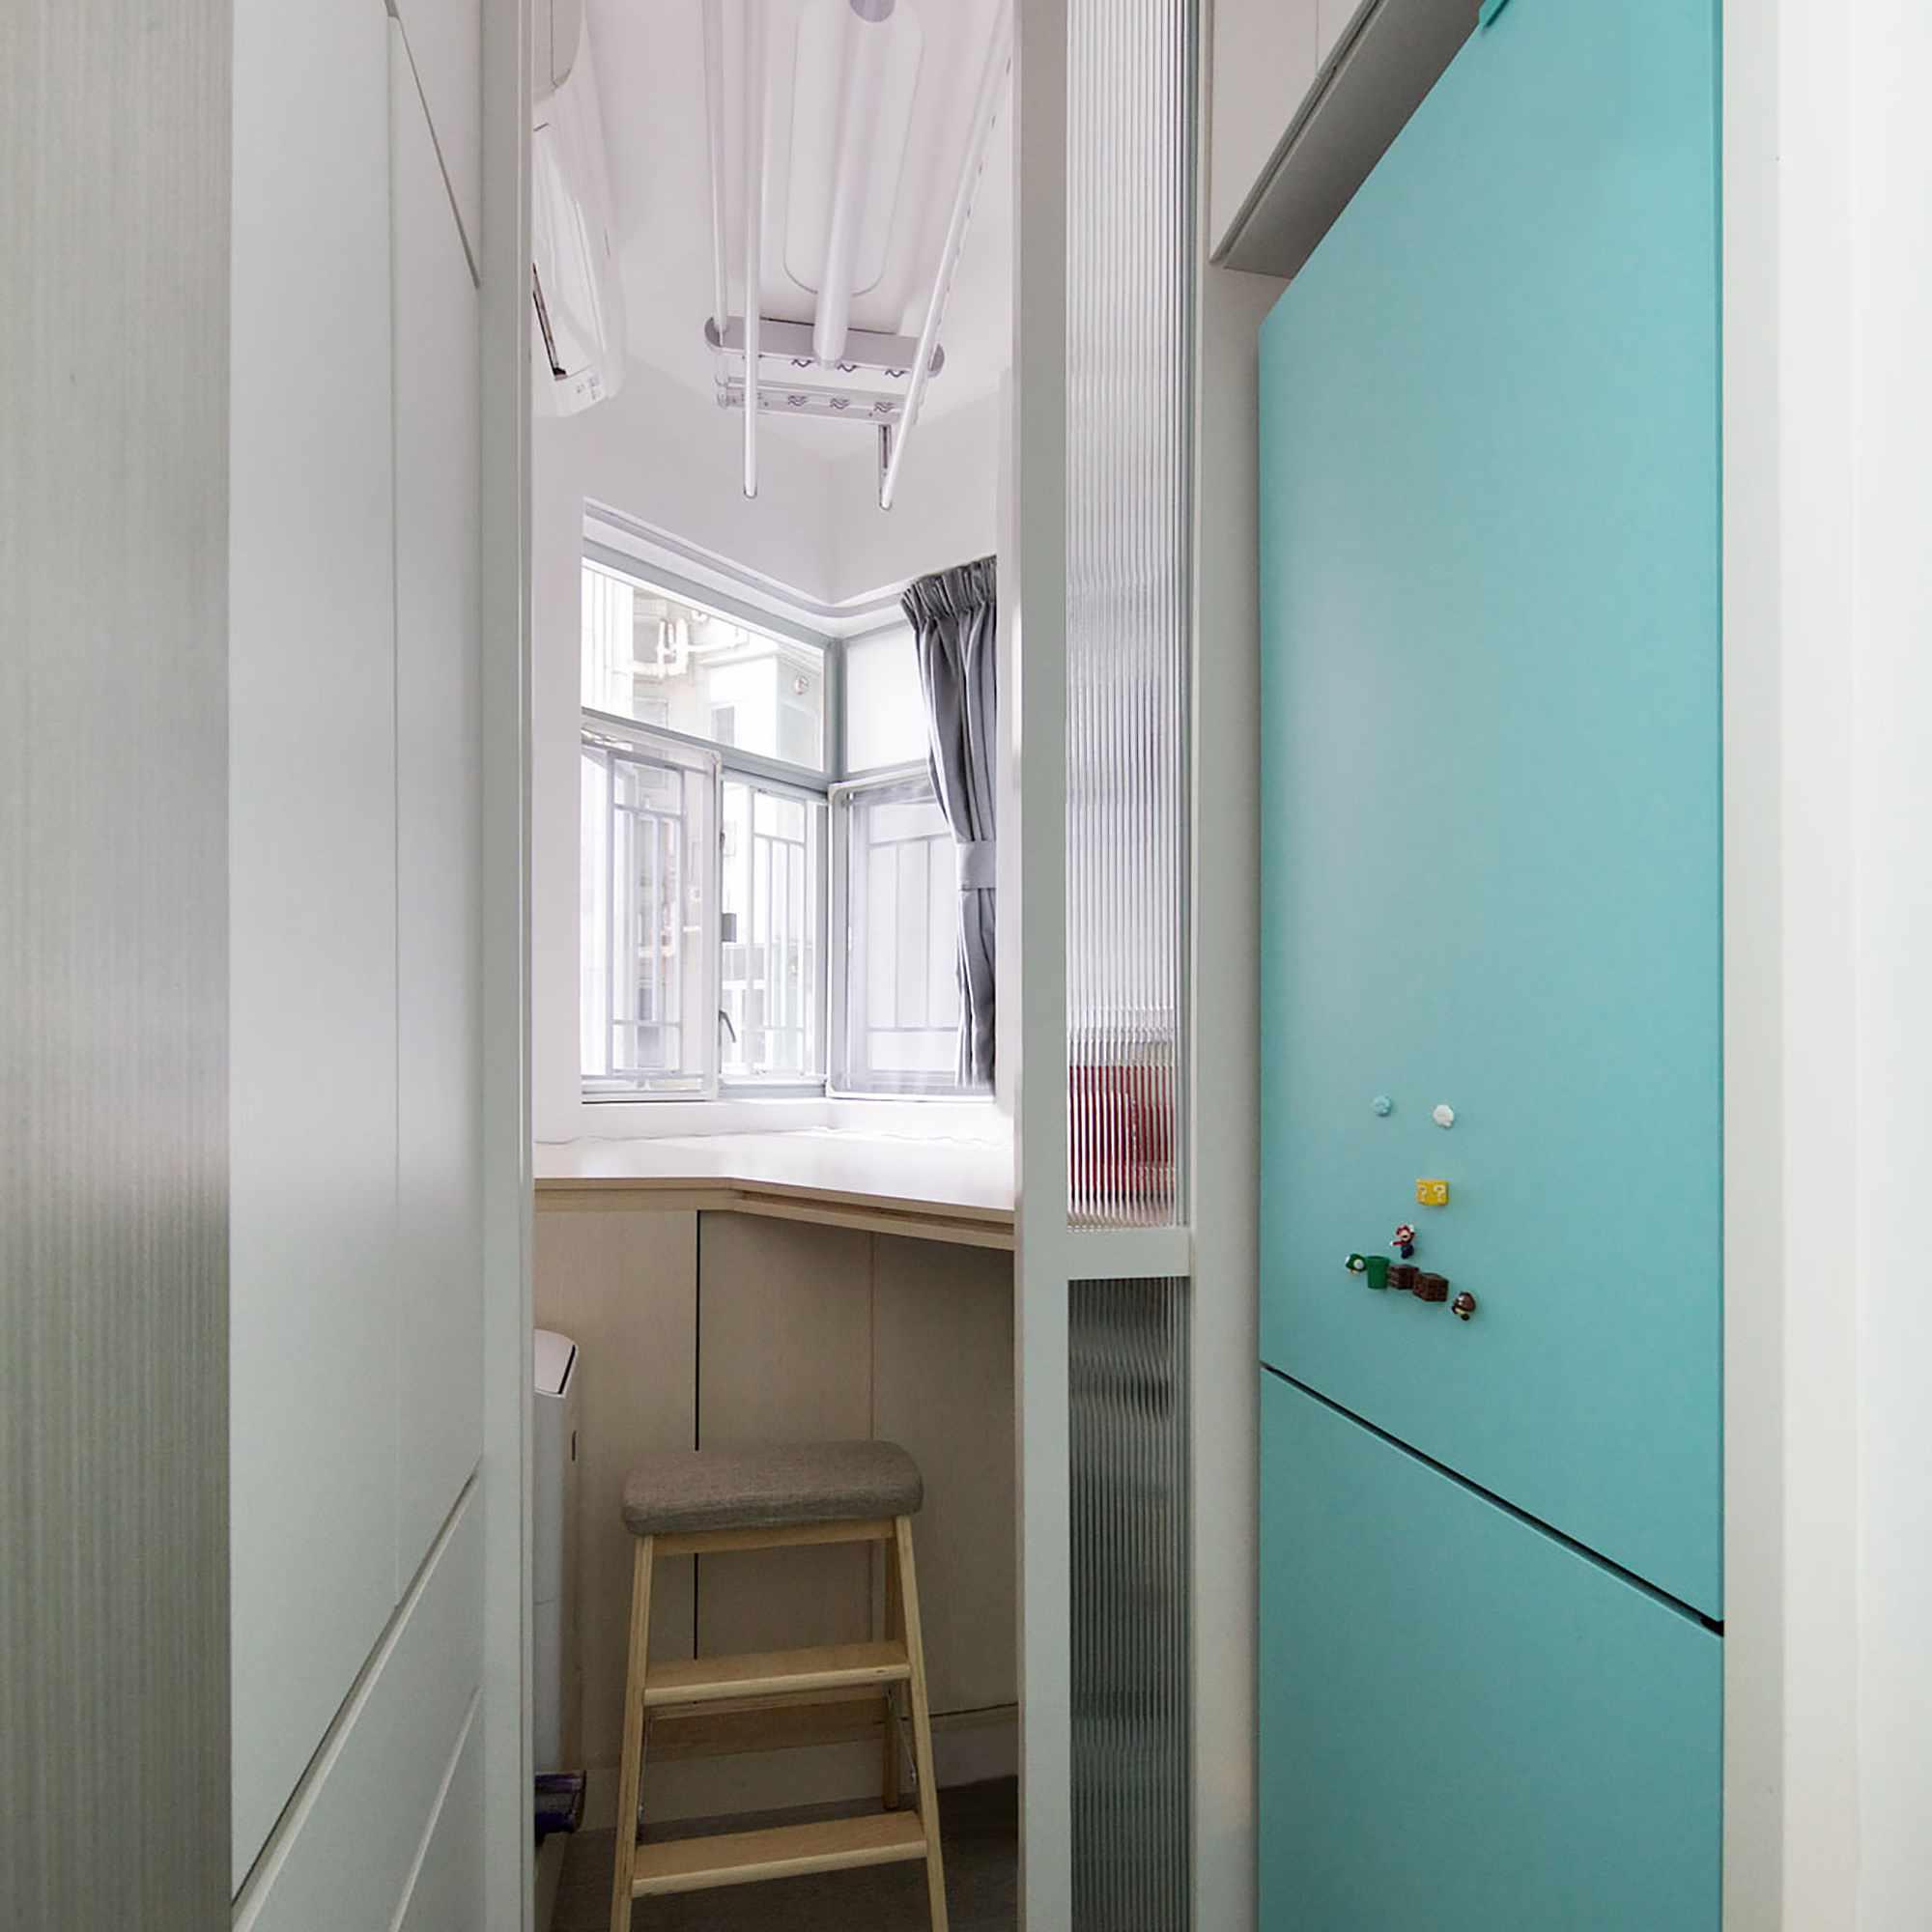 Smart Zendo micro-apartment by Sim-Plex Design Studio maid's room